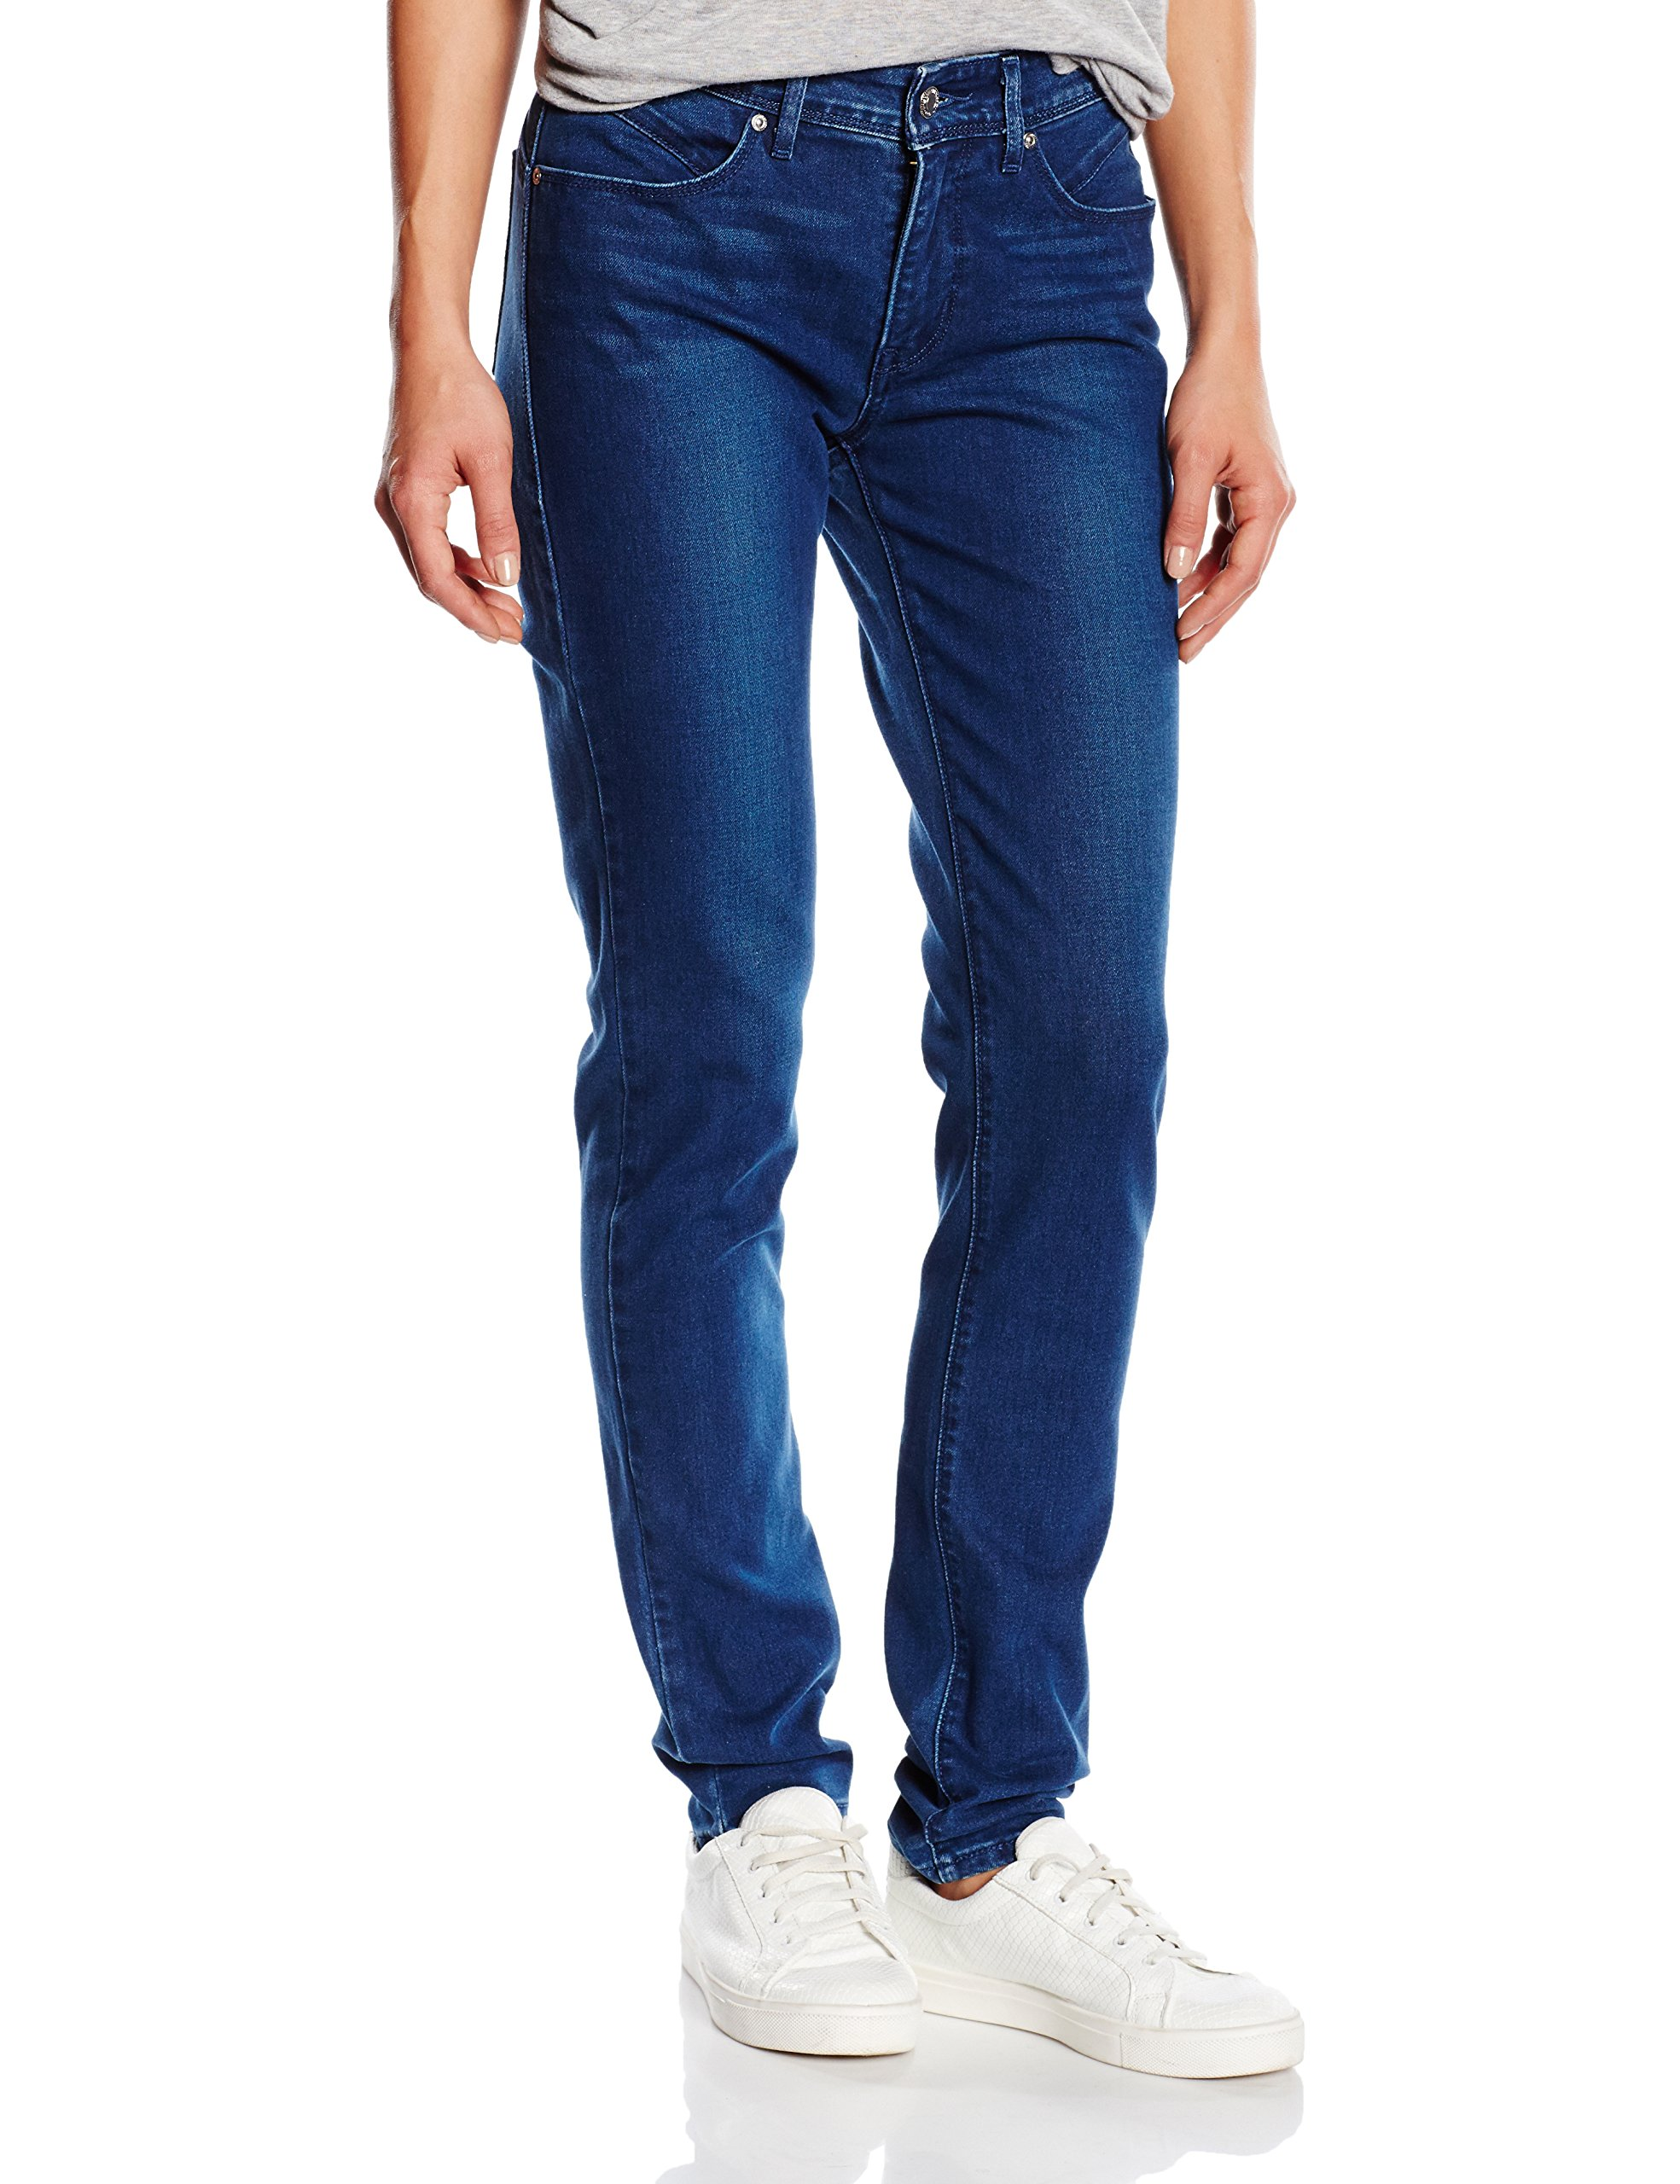 Dc Yondertaille SkinnyJeans Blue l32 FemmeBleubright Levi's Revel FabricantW26 QxEderBoWC